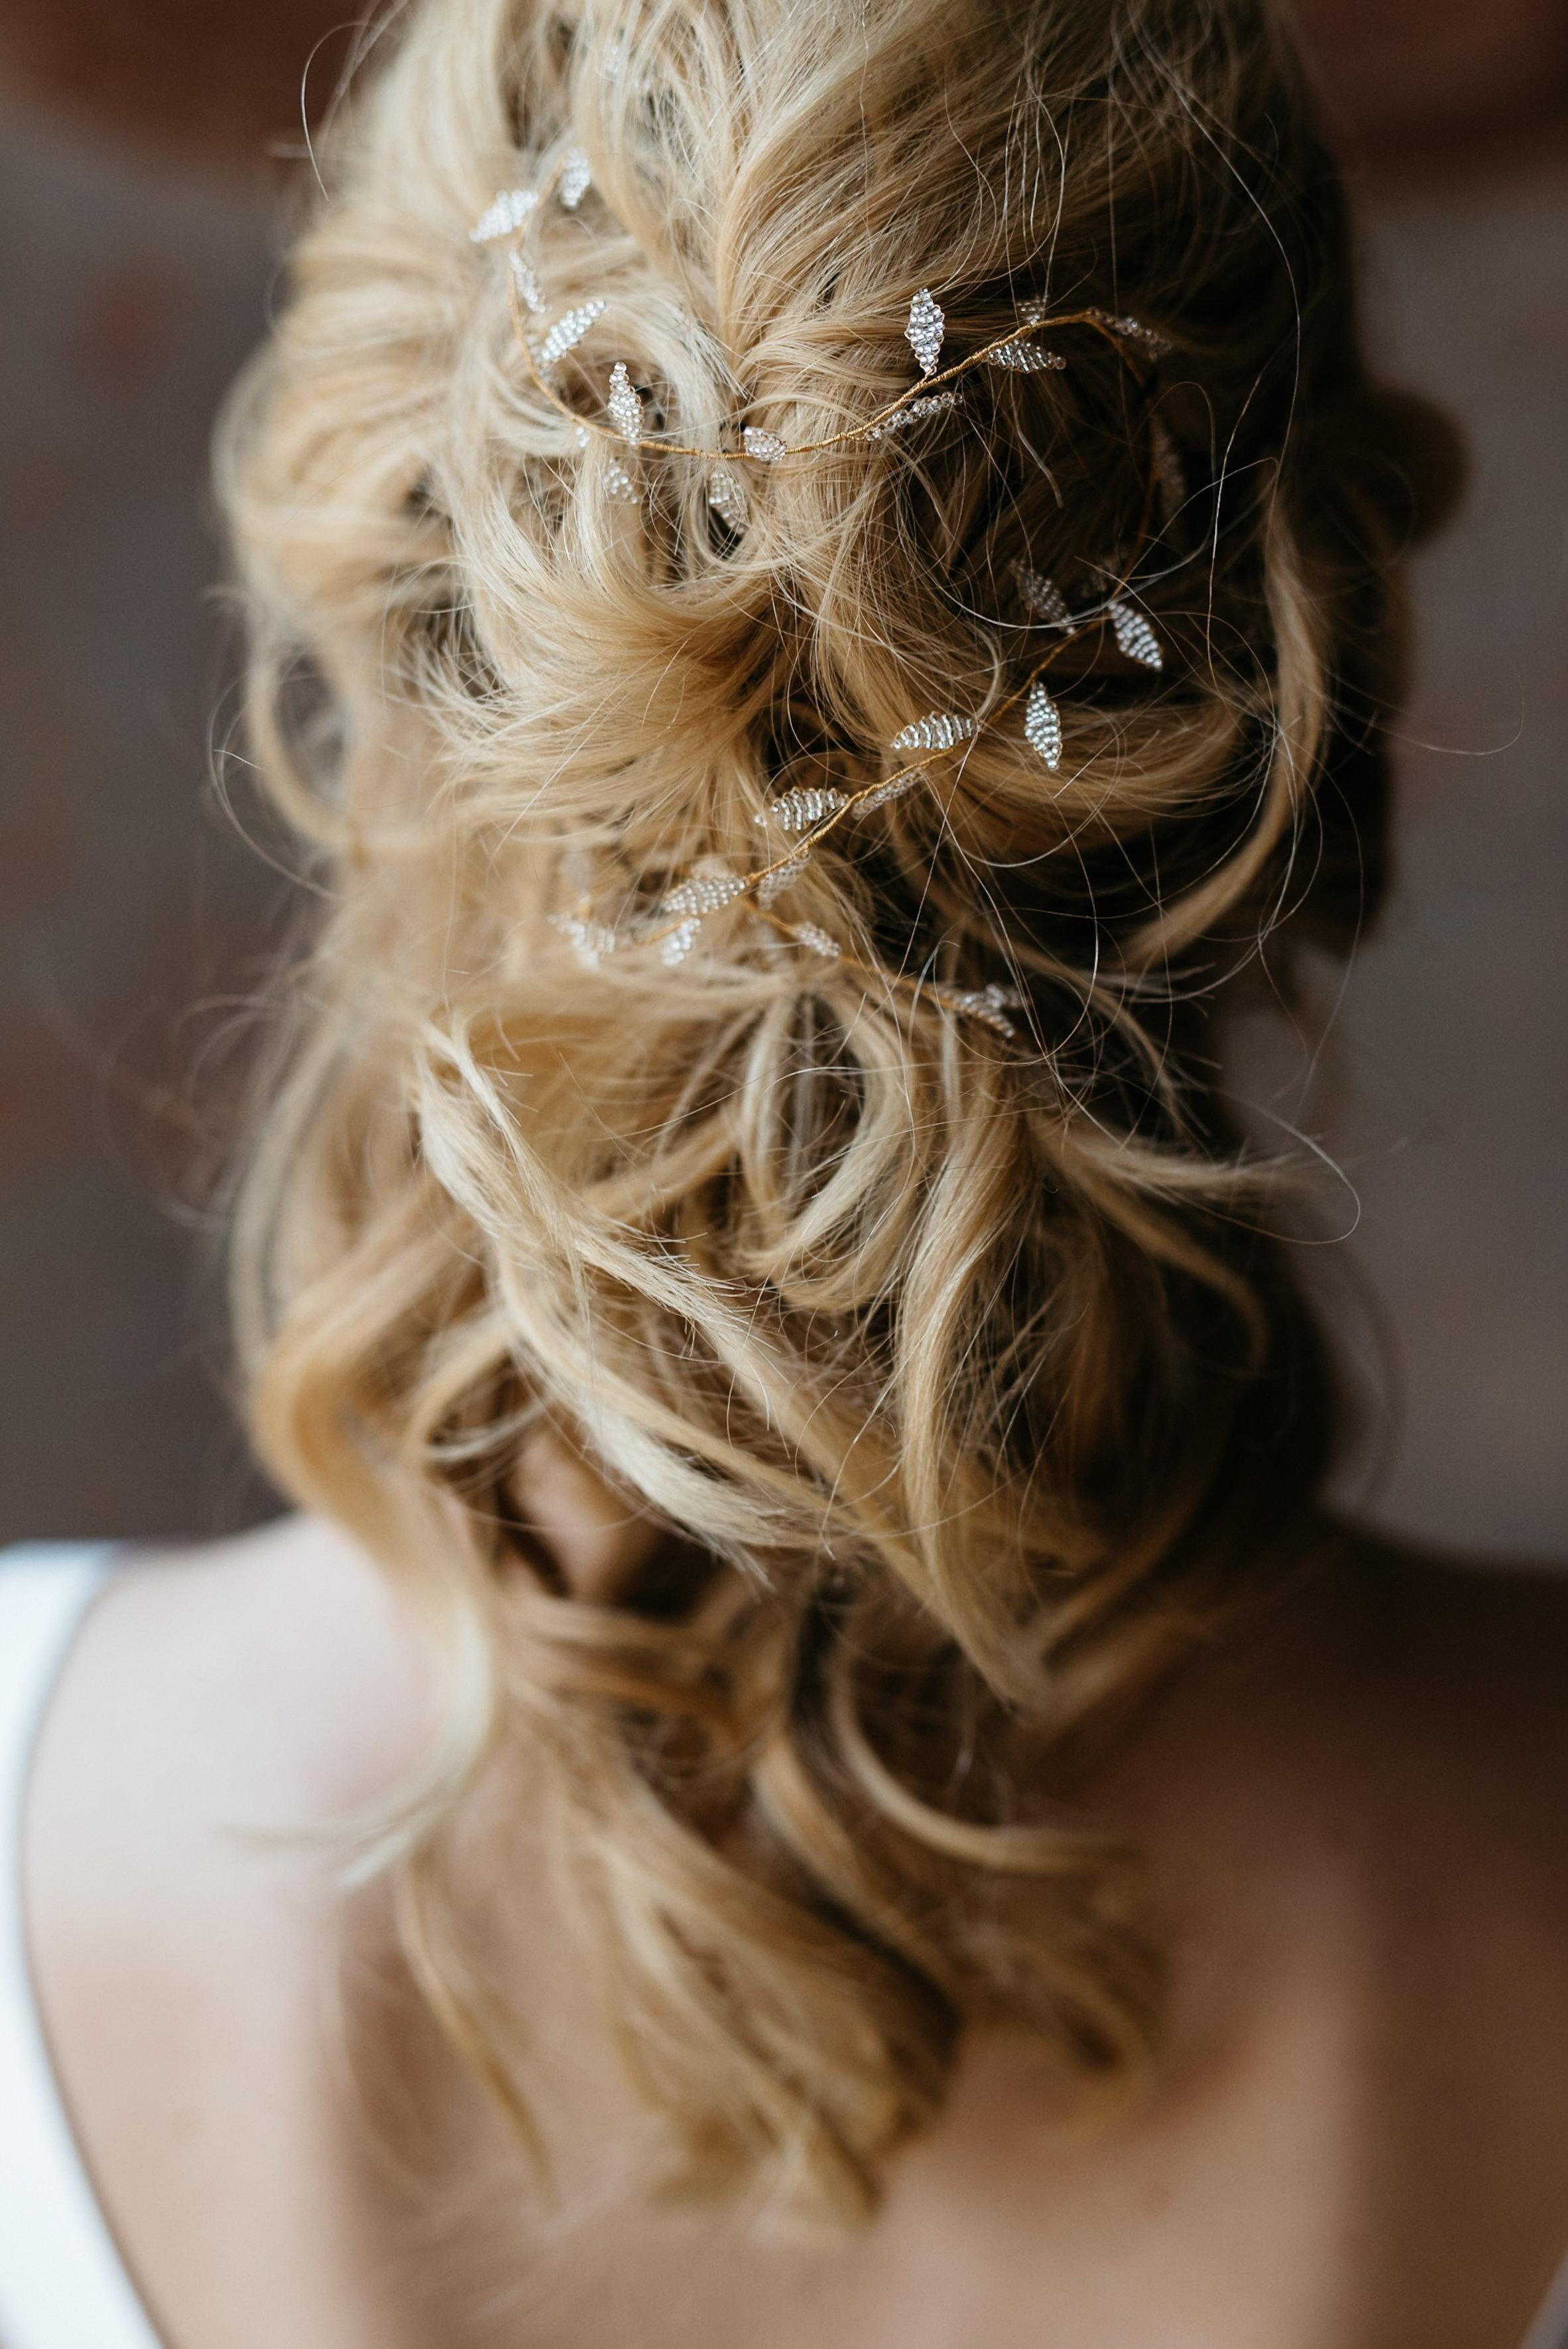 Fotografie: Marie Bleyer Fotografie   Make up & Haare: strahlkraft   Brautkleid: elfenkleid